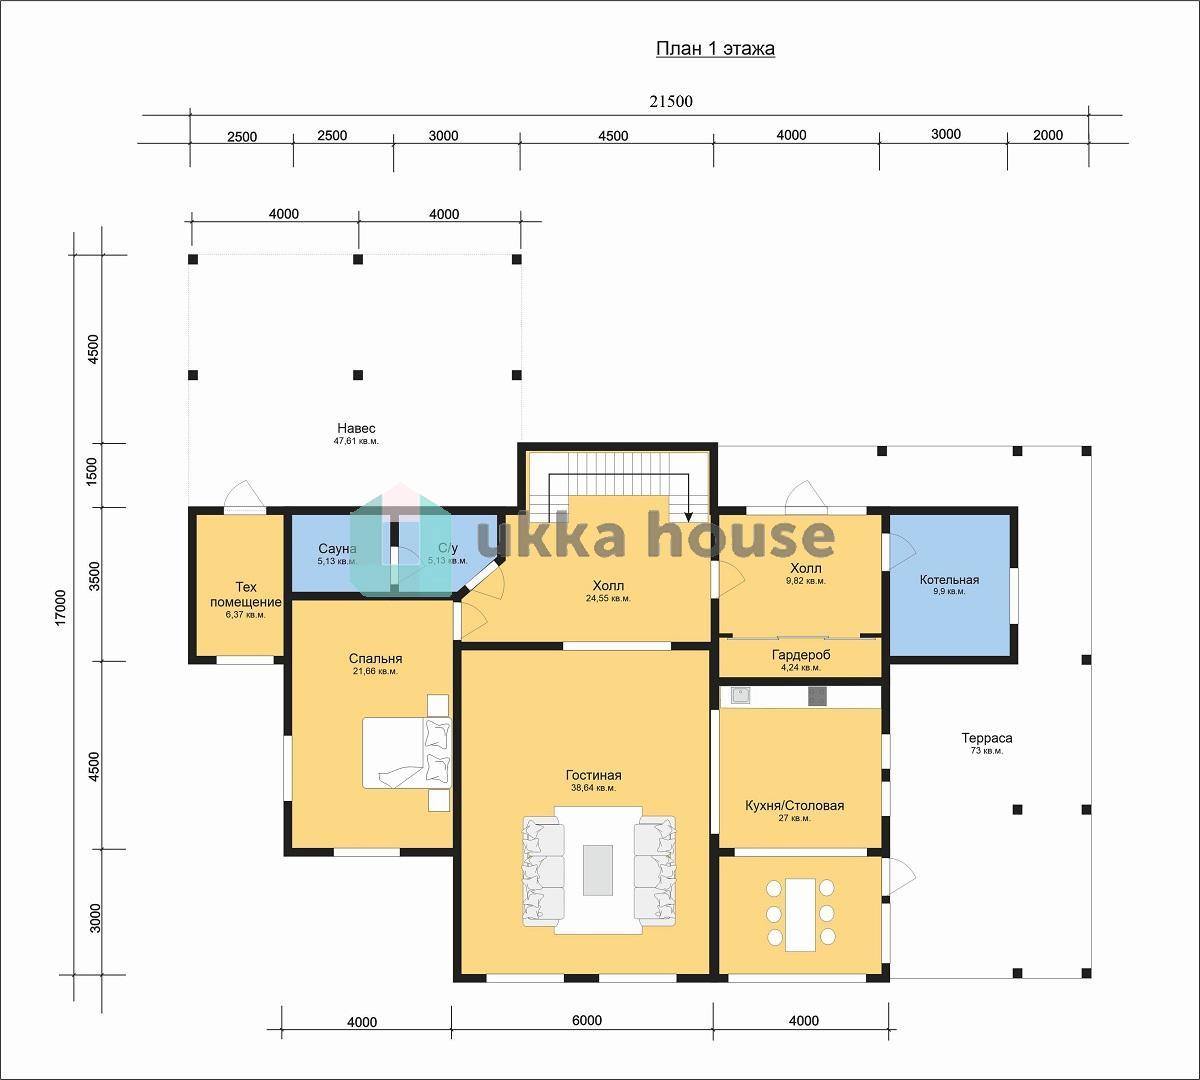 Проект «Девиант. План 1 этажа.»